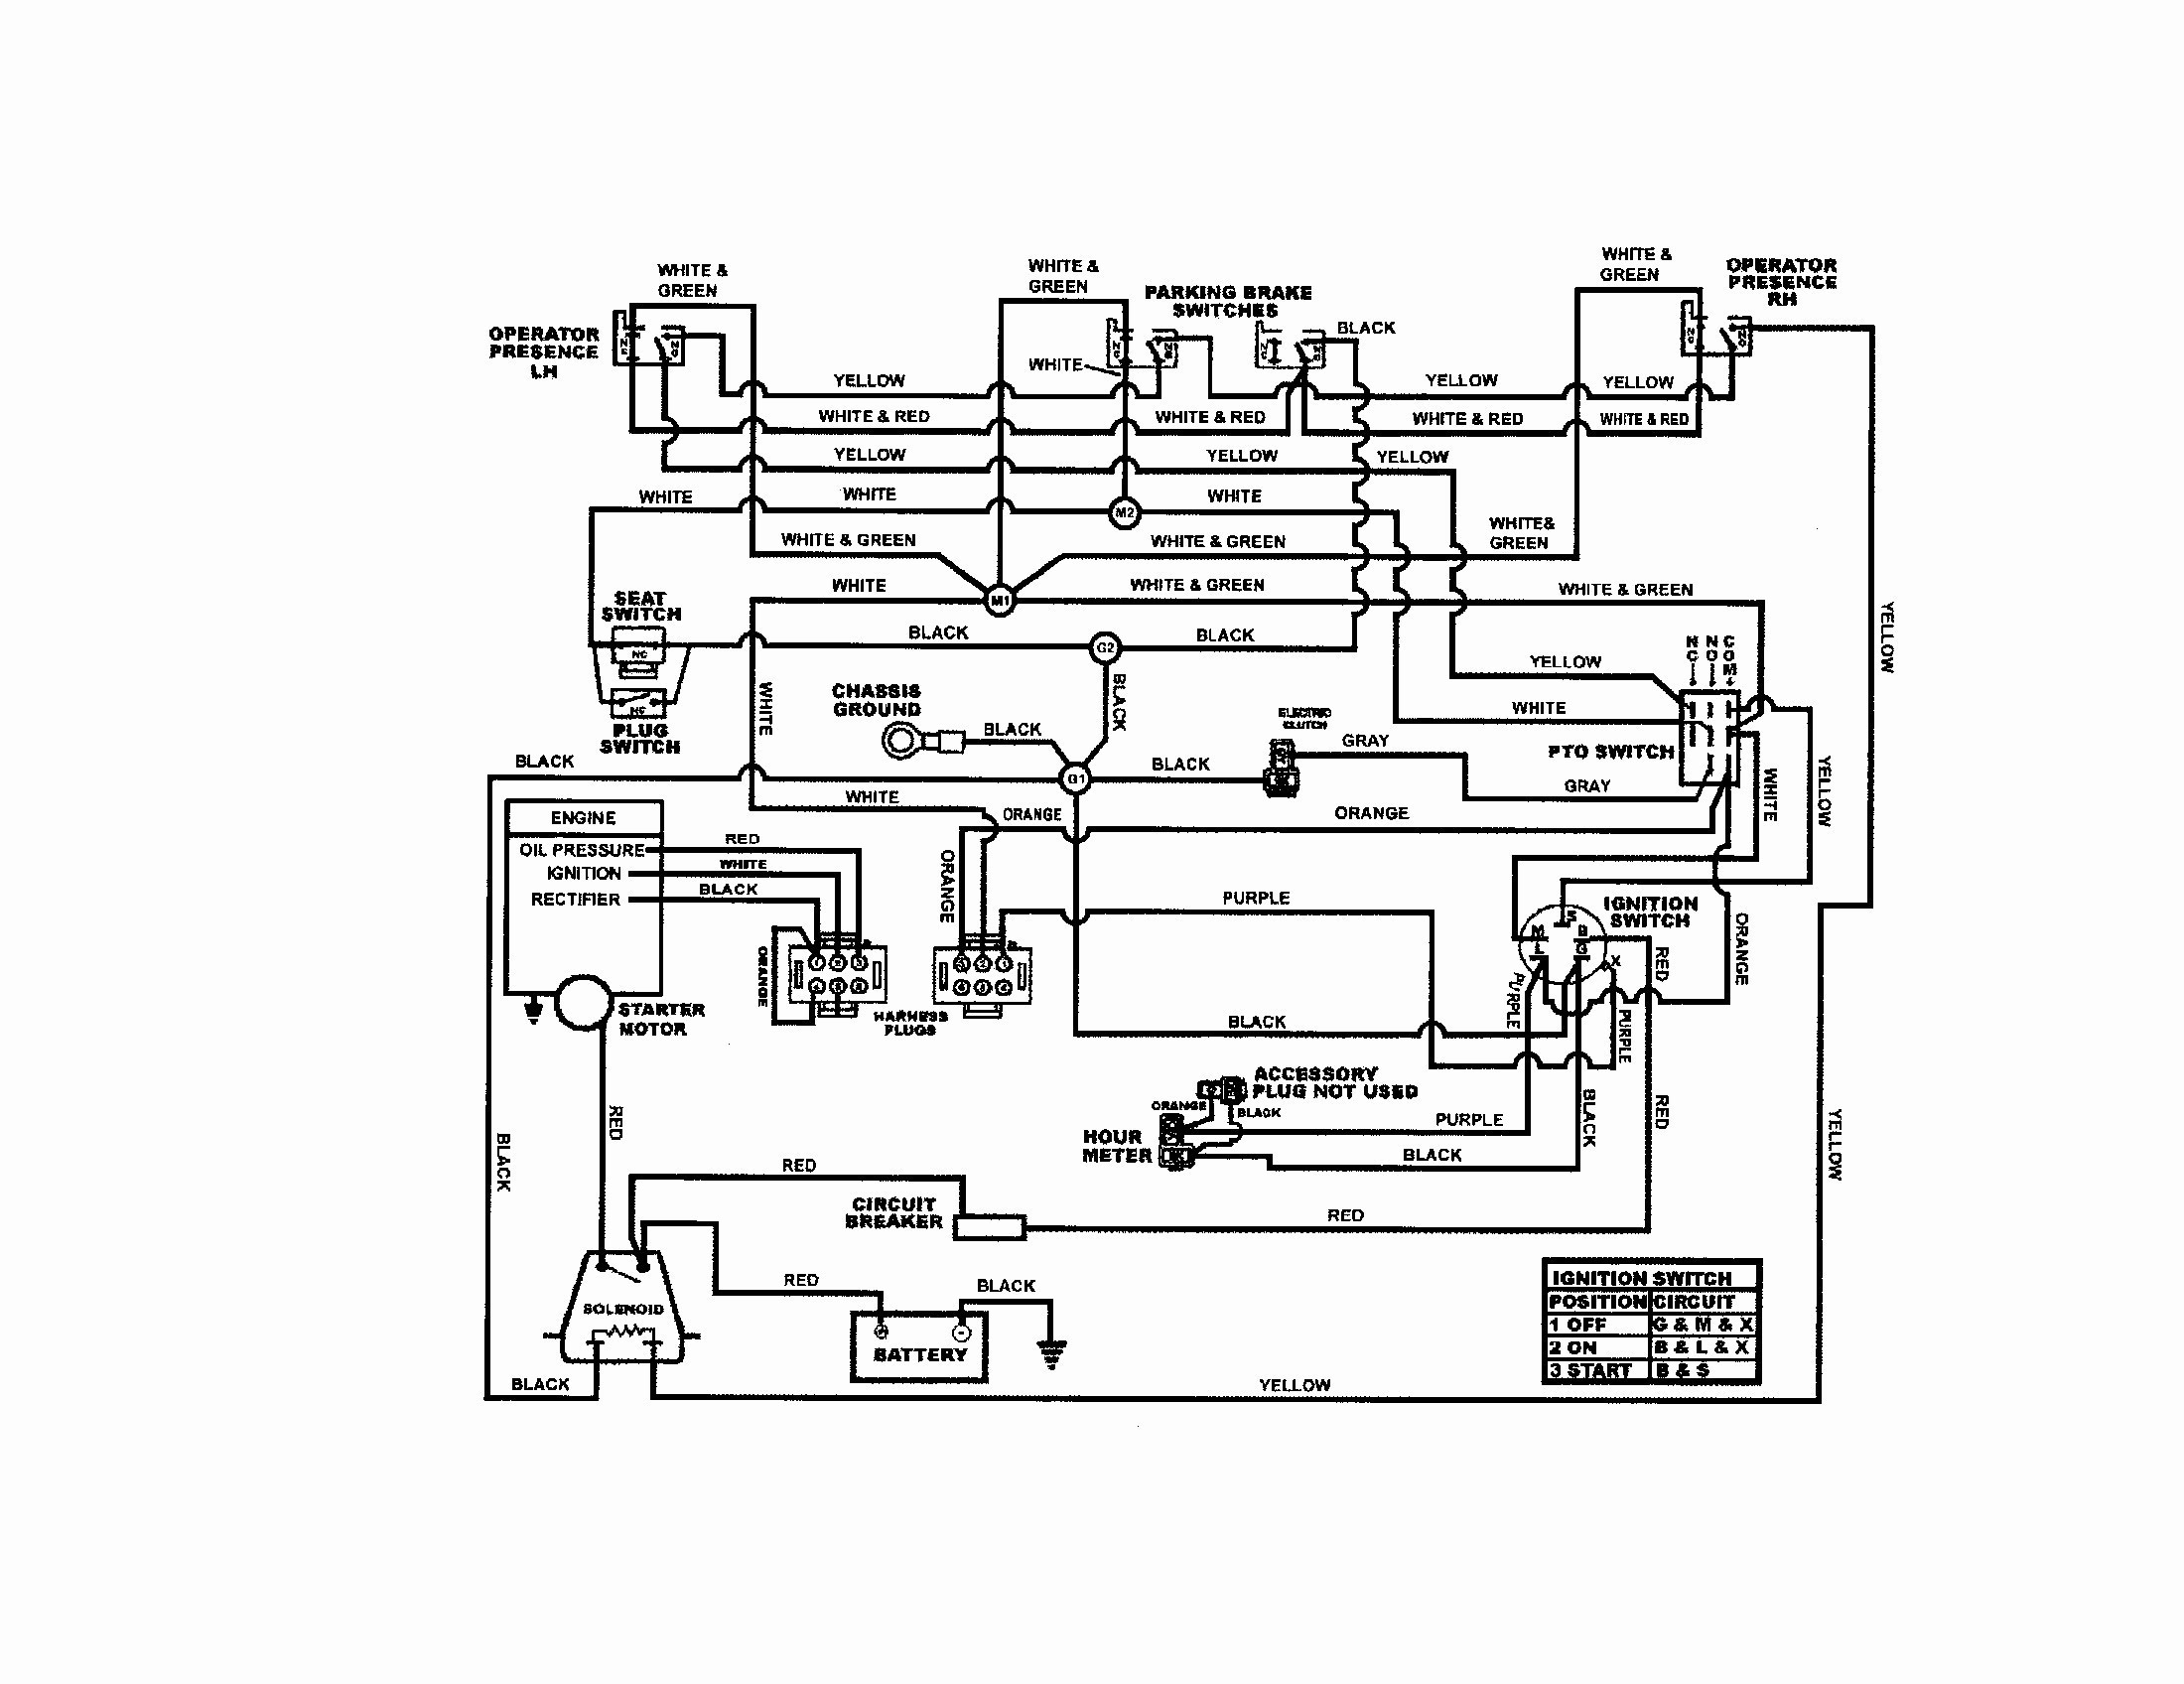 20 Hp Briggs and Stratton Engine Diagram Briggs and Stratton Ignition Wiring Wiring Diagram for • Of 20 Hp Briggs and Stratton Engine Diagram